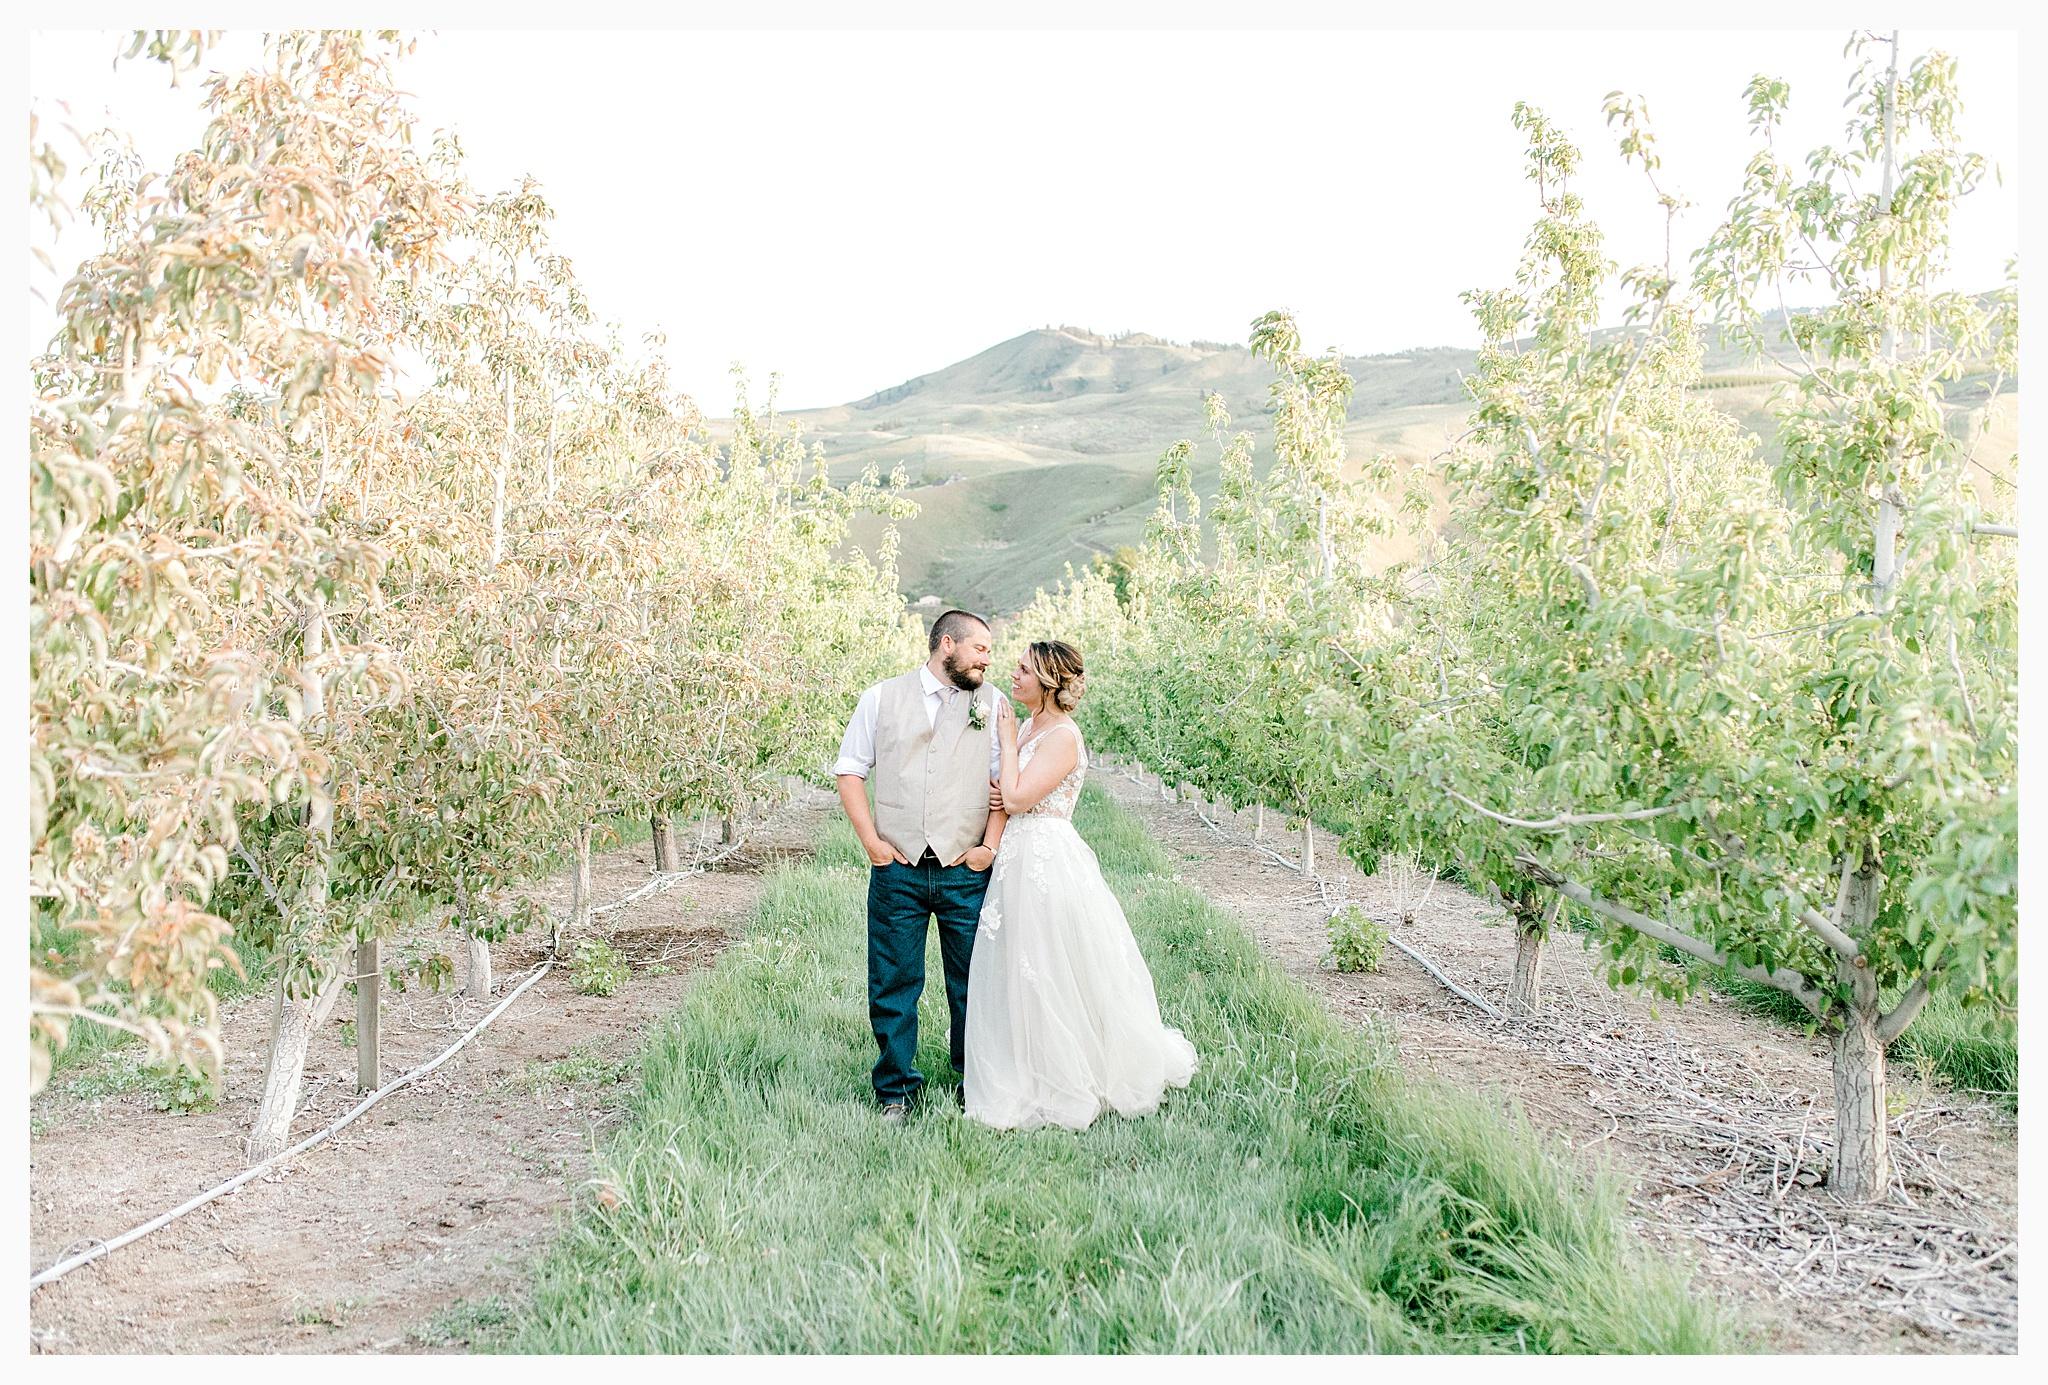 Rustic barn wedding in Wenatchee Washington at Sunshine Ranch on Easy Street, Emma Rose Company Seattle PNW Light and Airy Wedding Photographer_0134.jpg